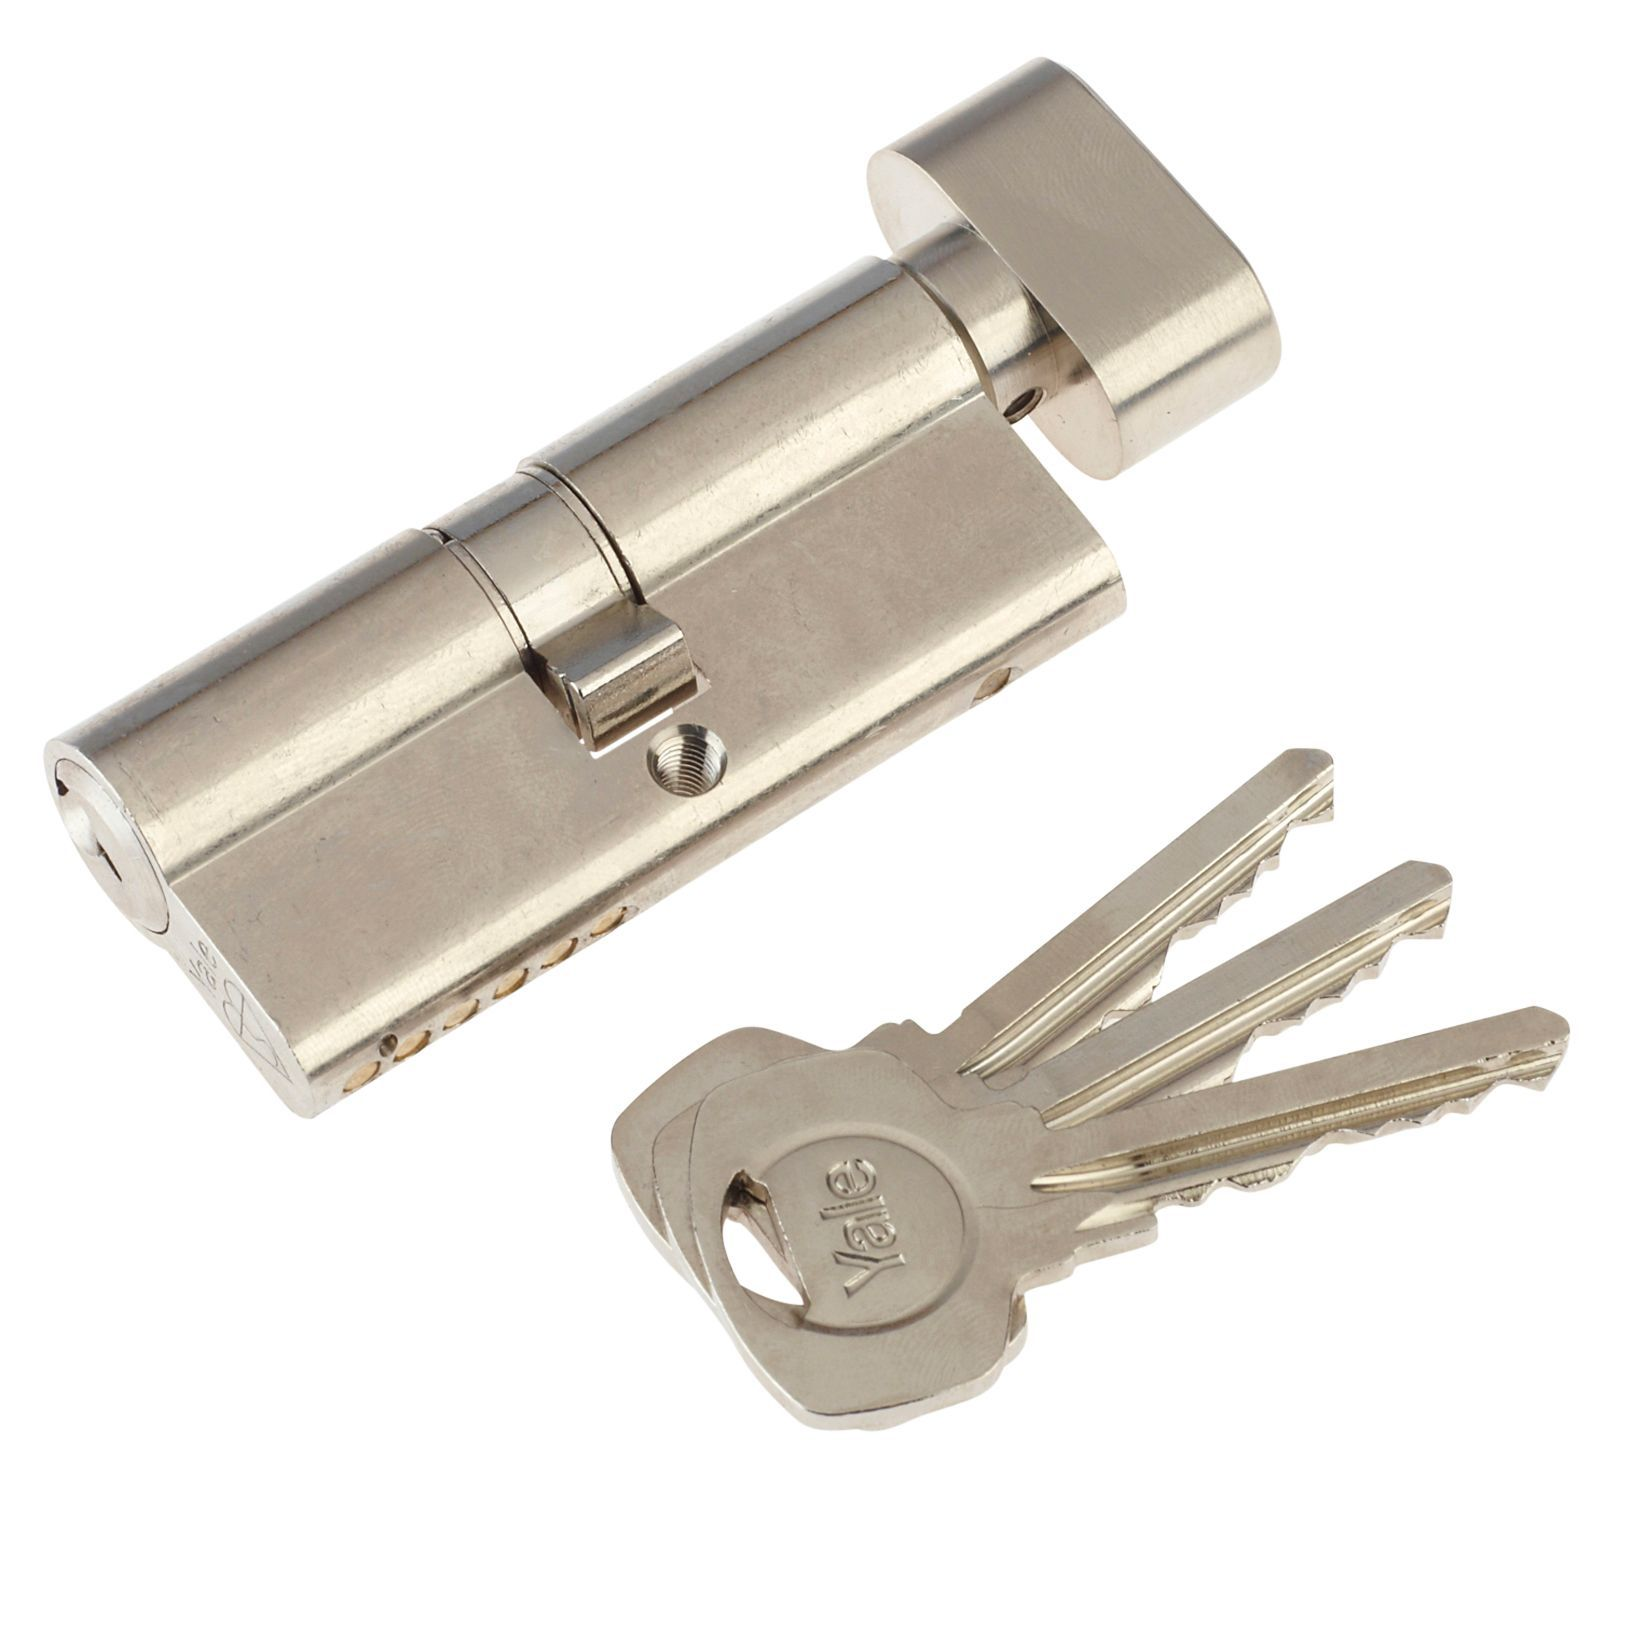 Yale 70mm Nickel Plated Thumbturn Euro Cylinder Lock